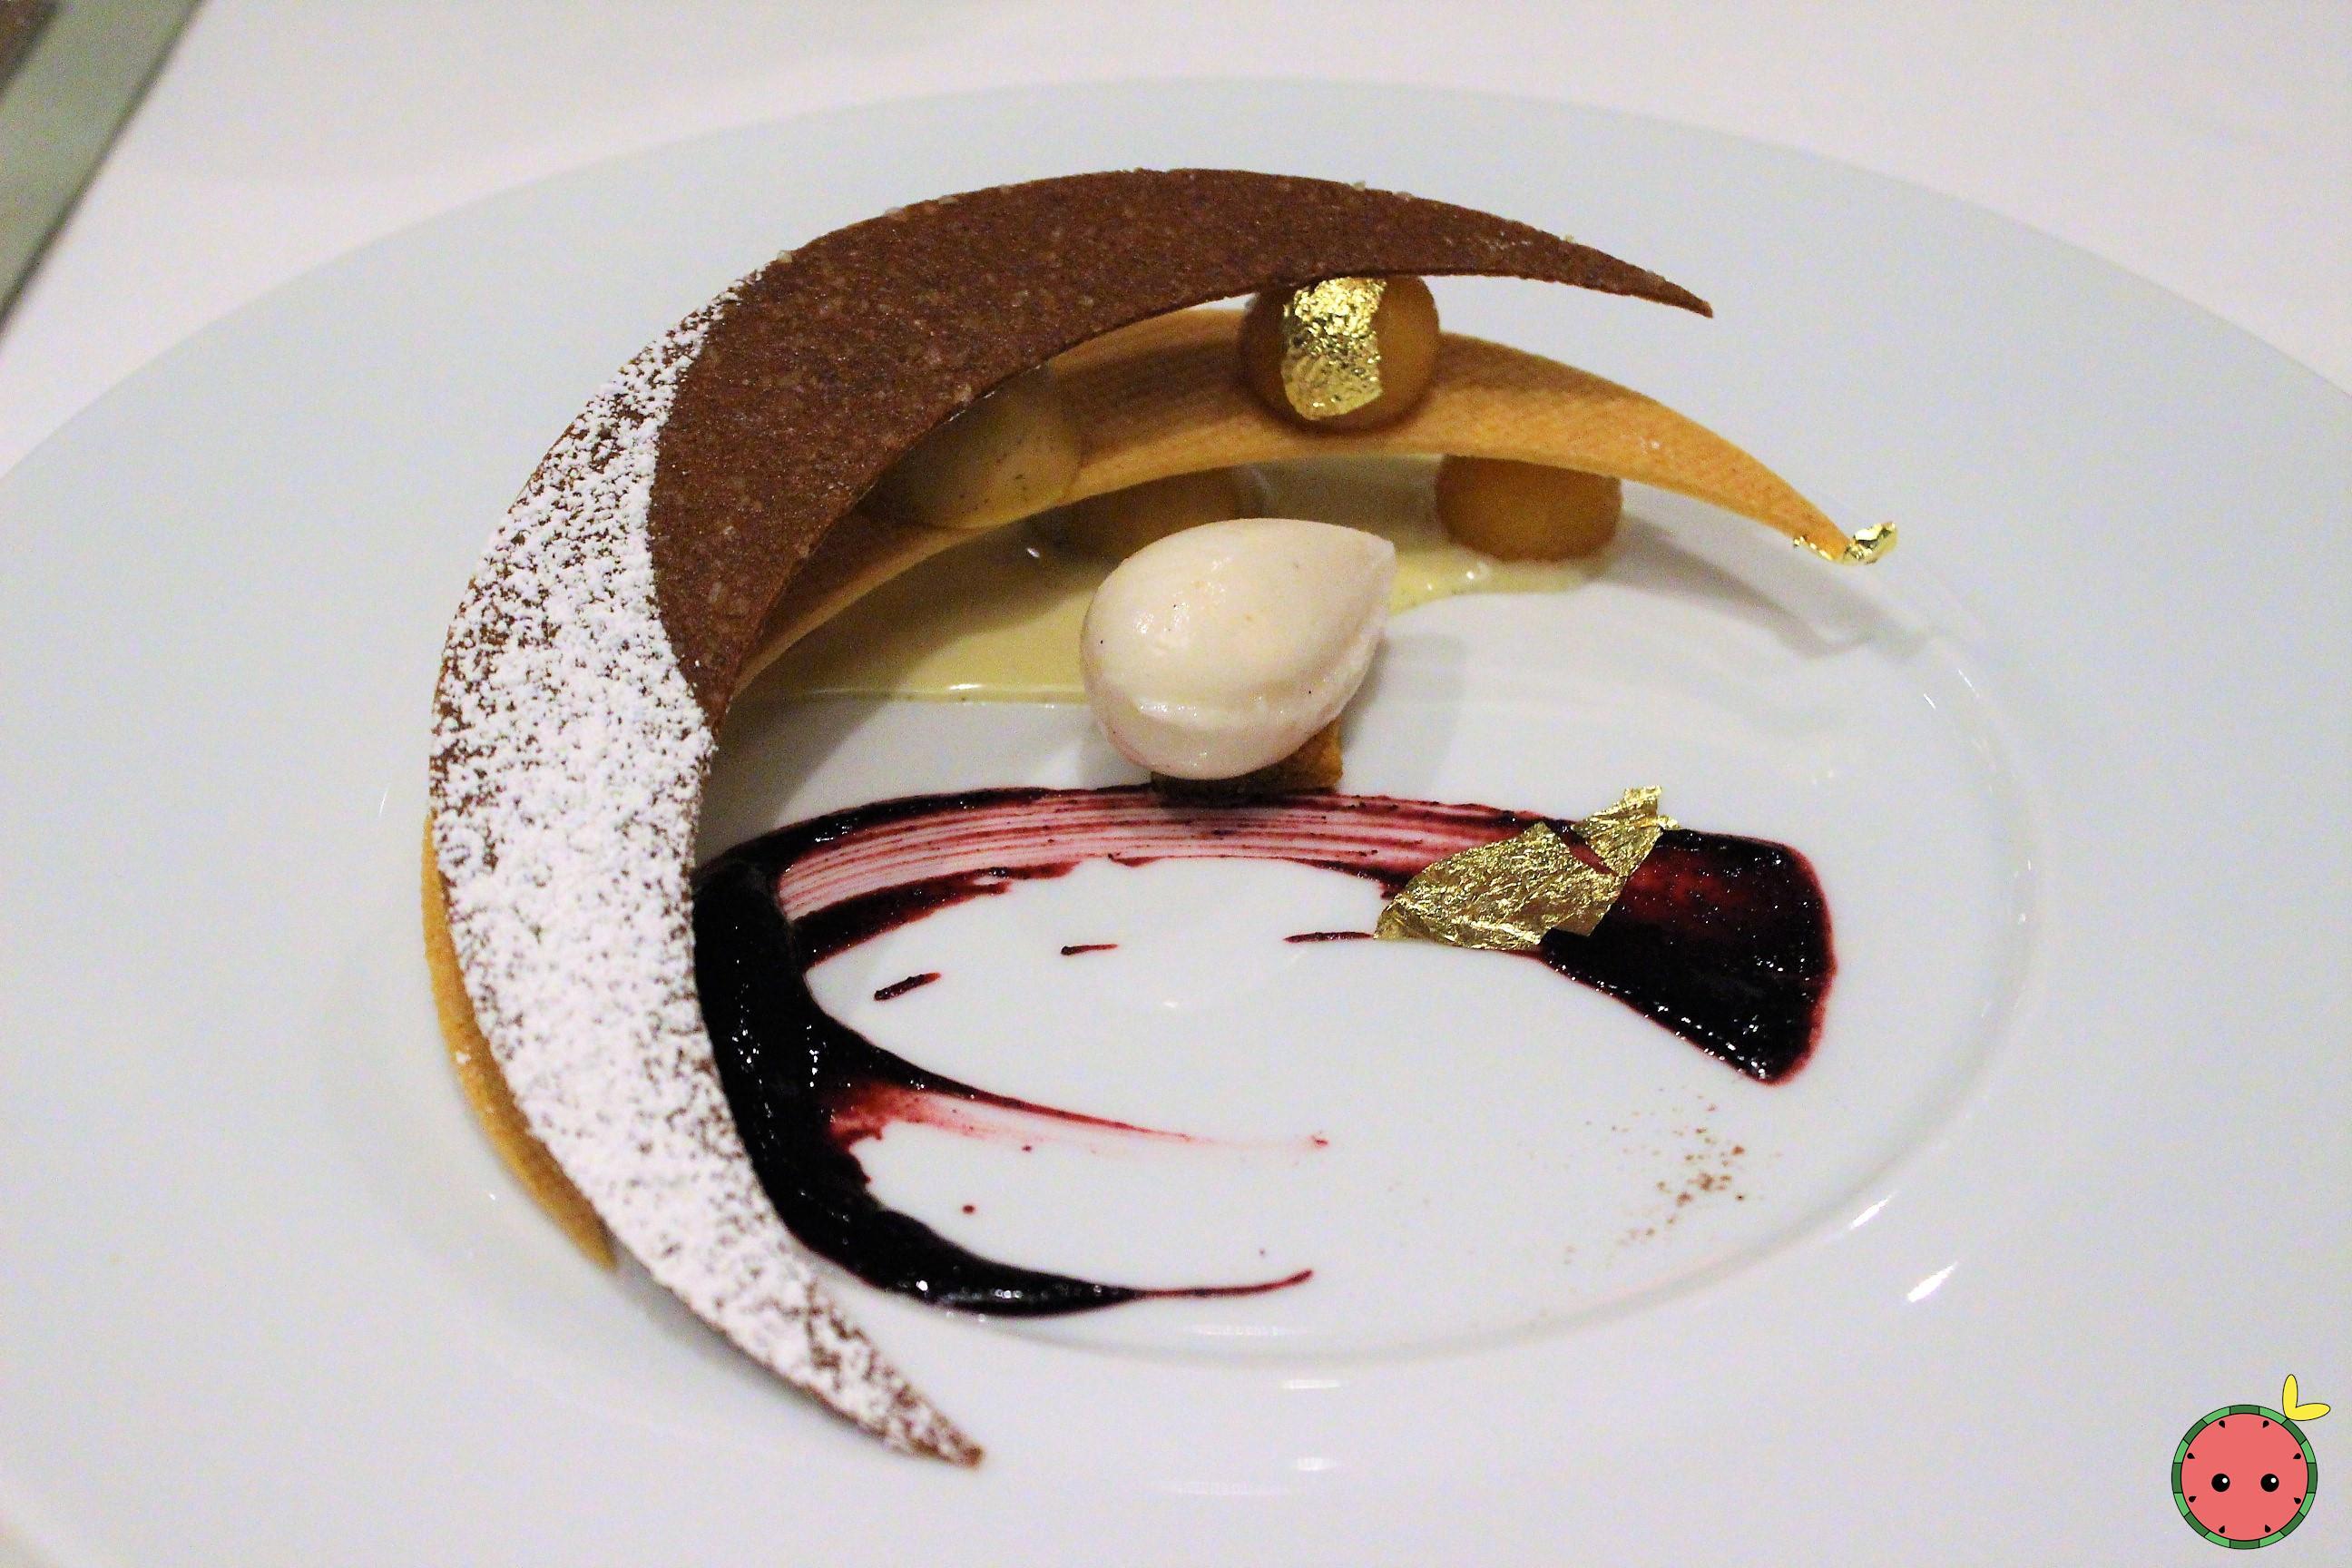 Comfort_Caramel_Pear_Dessert_(gingersnap_tuile,_caramel-pear_crémeux,_pear_sorbet)